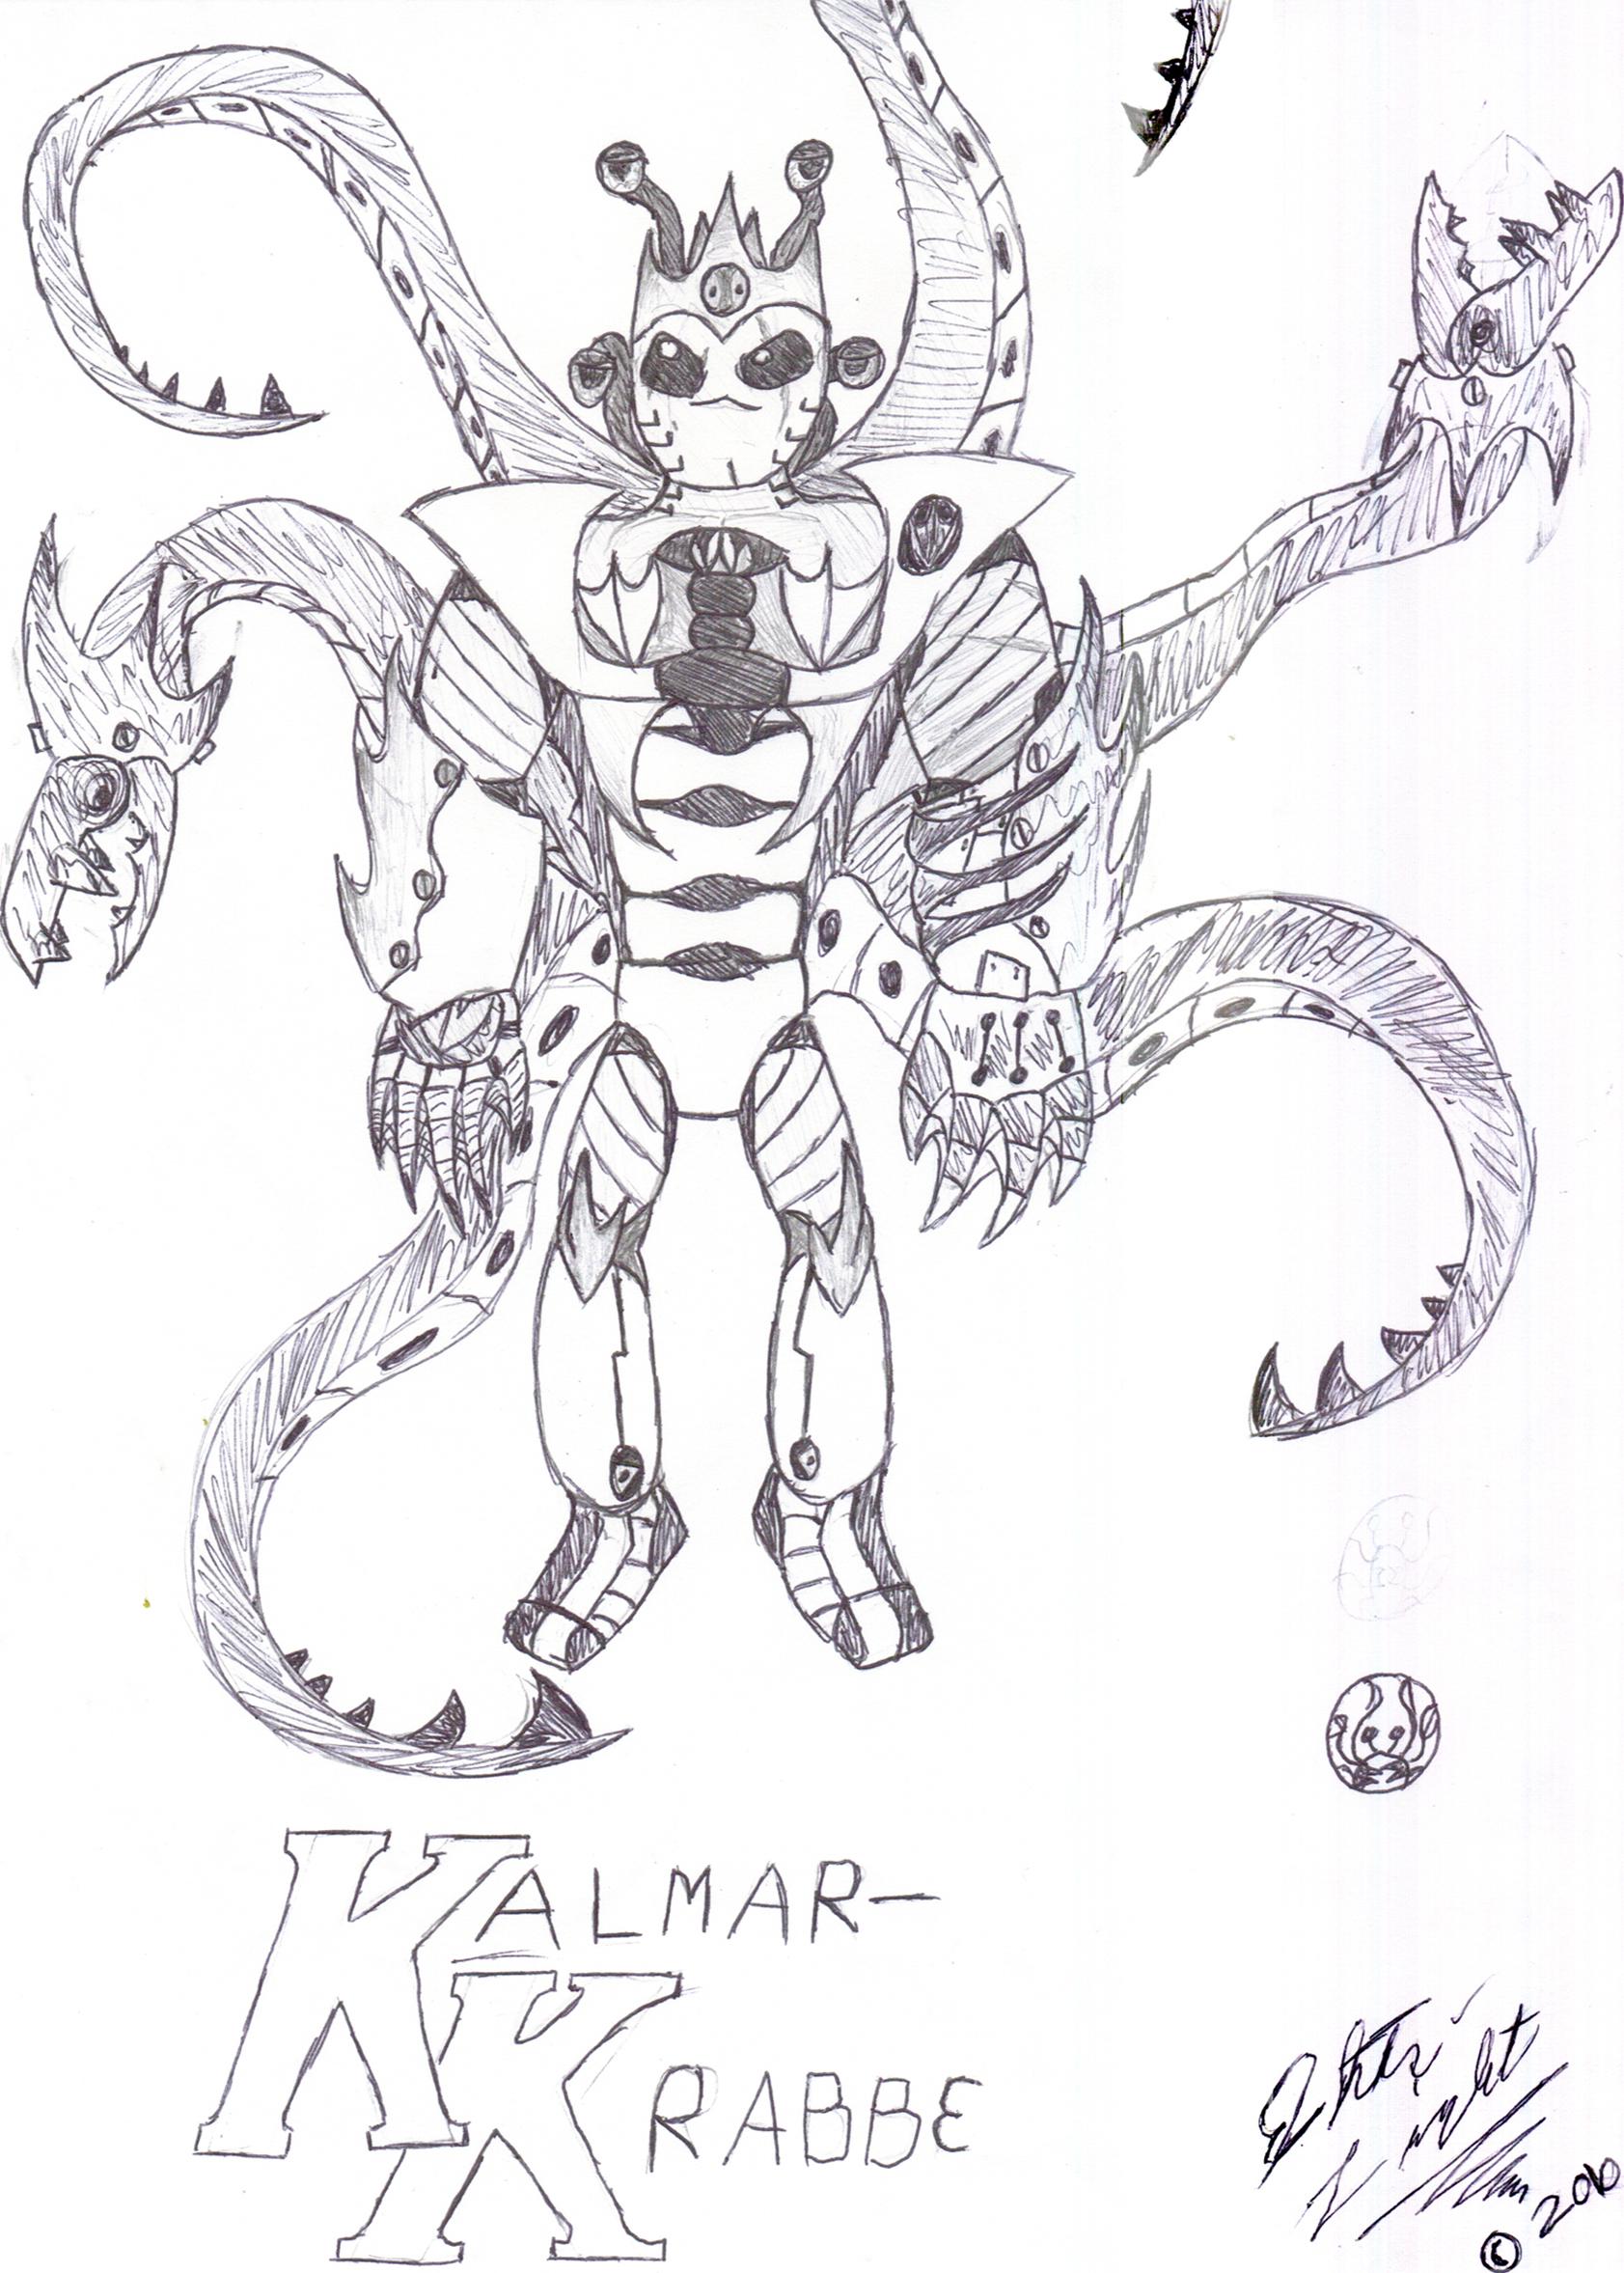 Kalmar-Krabbe